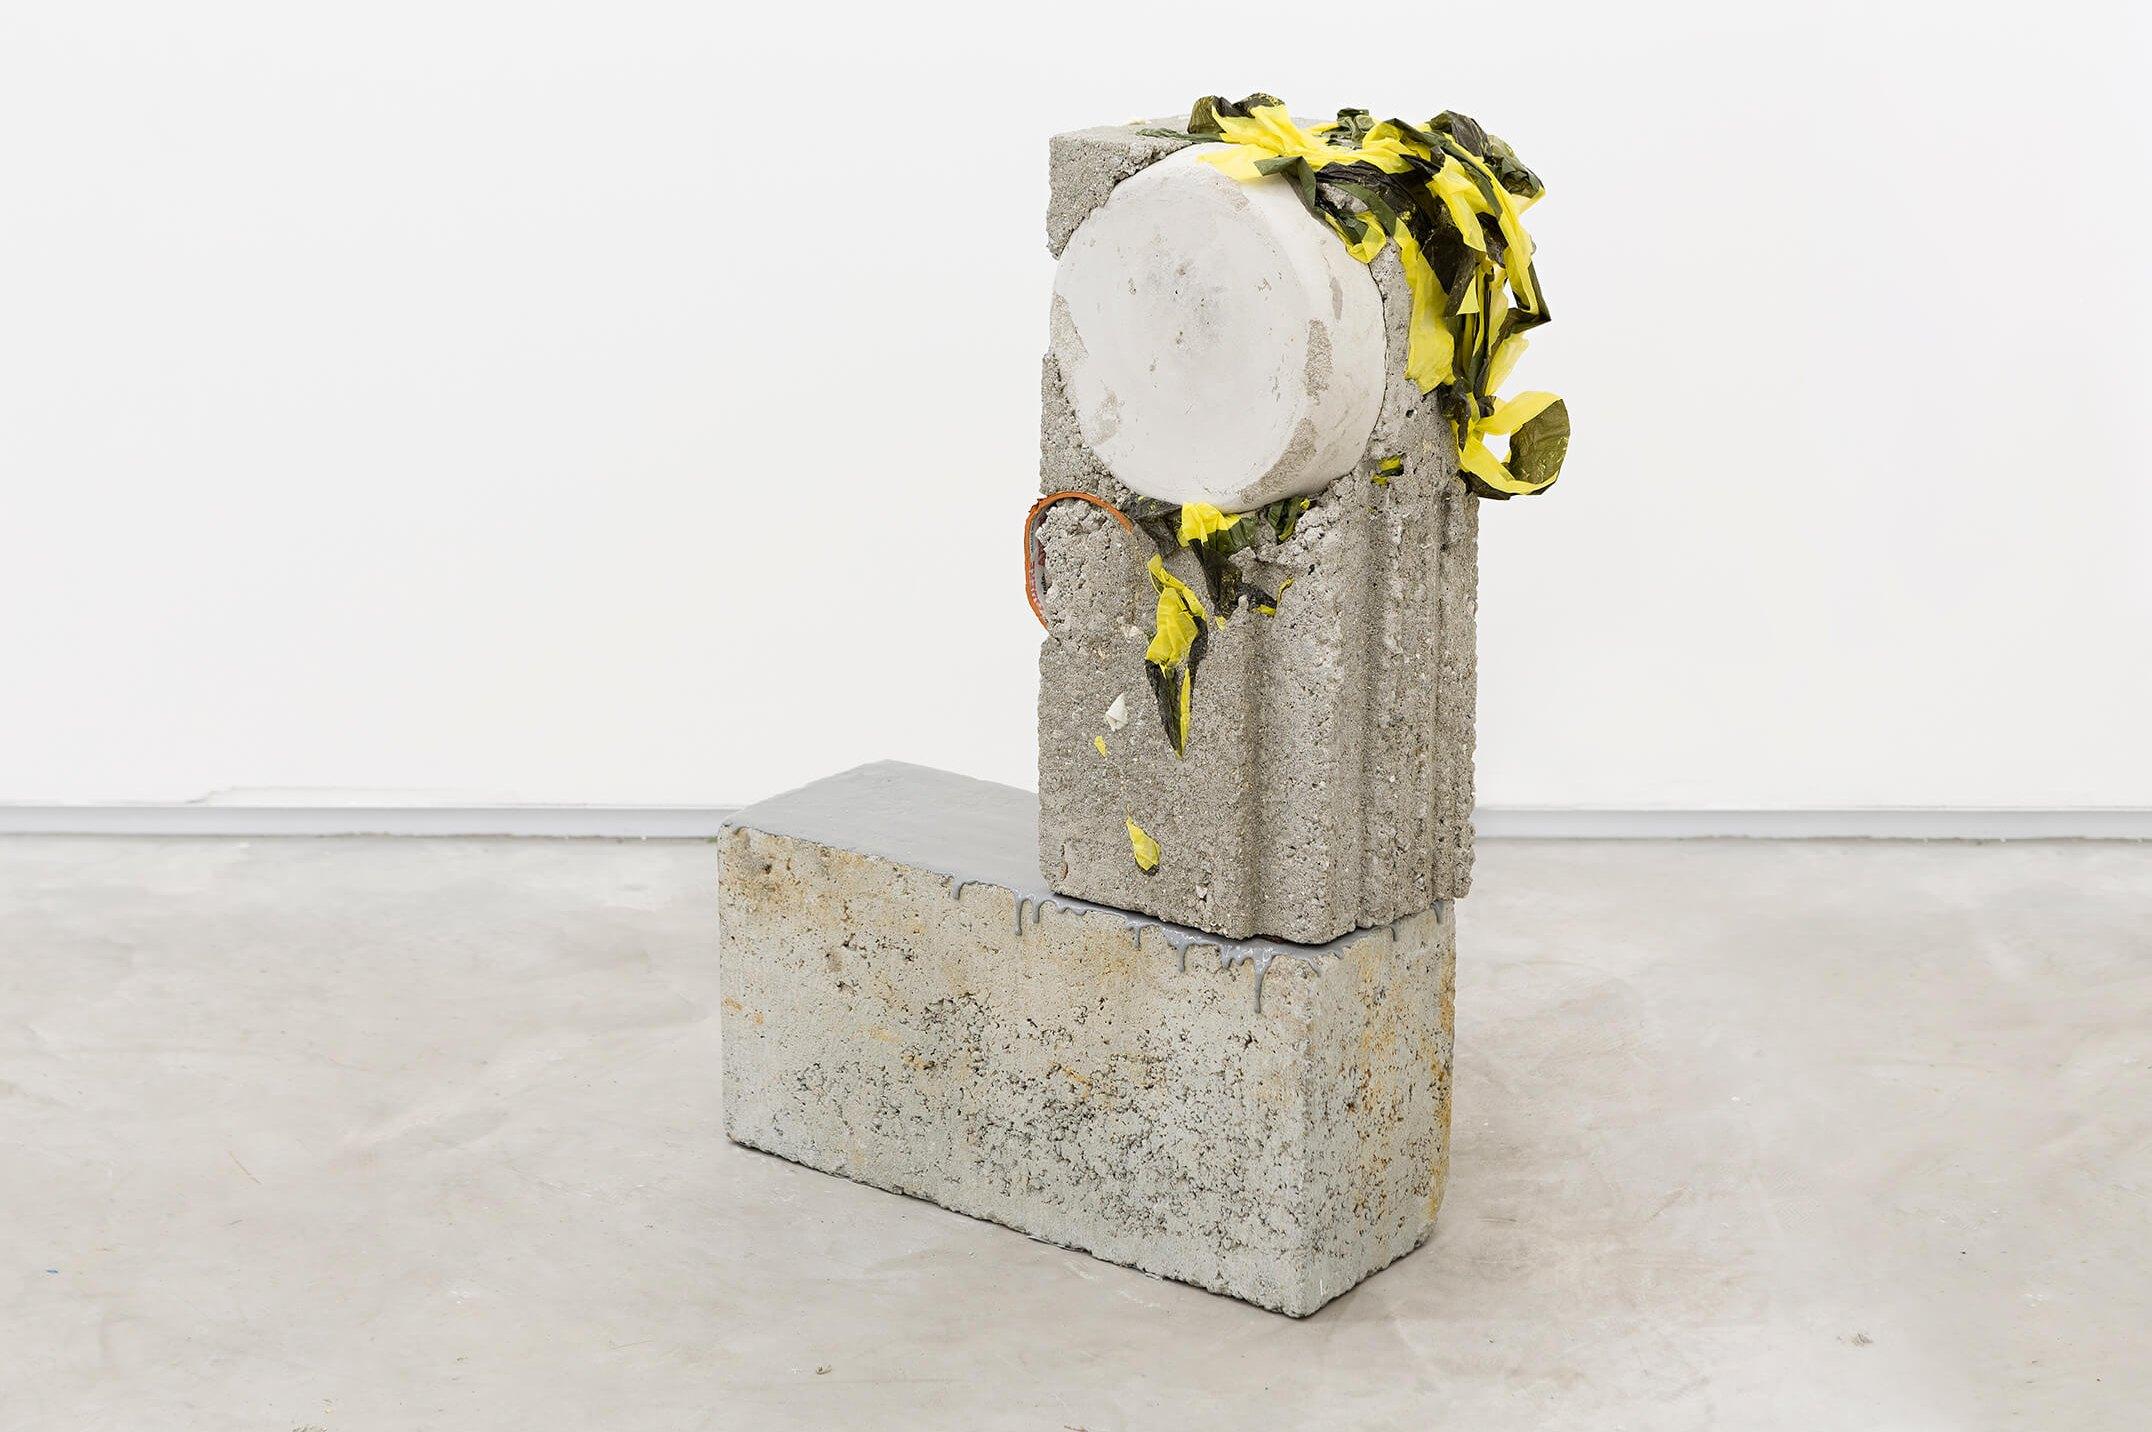 Allyson Vieira,&nbsp;<em>Block 1, Block 16</em>, 2015,&nbsp;concrete, <em>Worker</em> scraps, concrete blocks, epoxy,&nbsp;59 × 39 ×&nbsp;14 cm - Mendes Wood DM